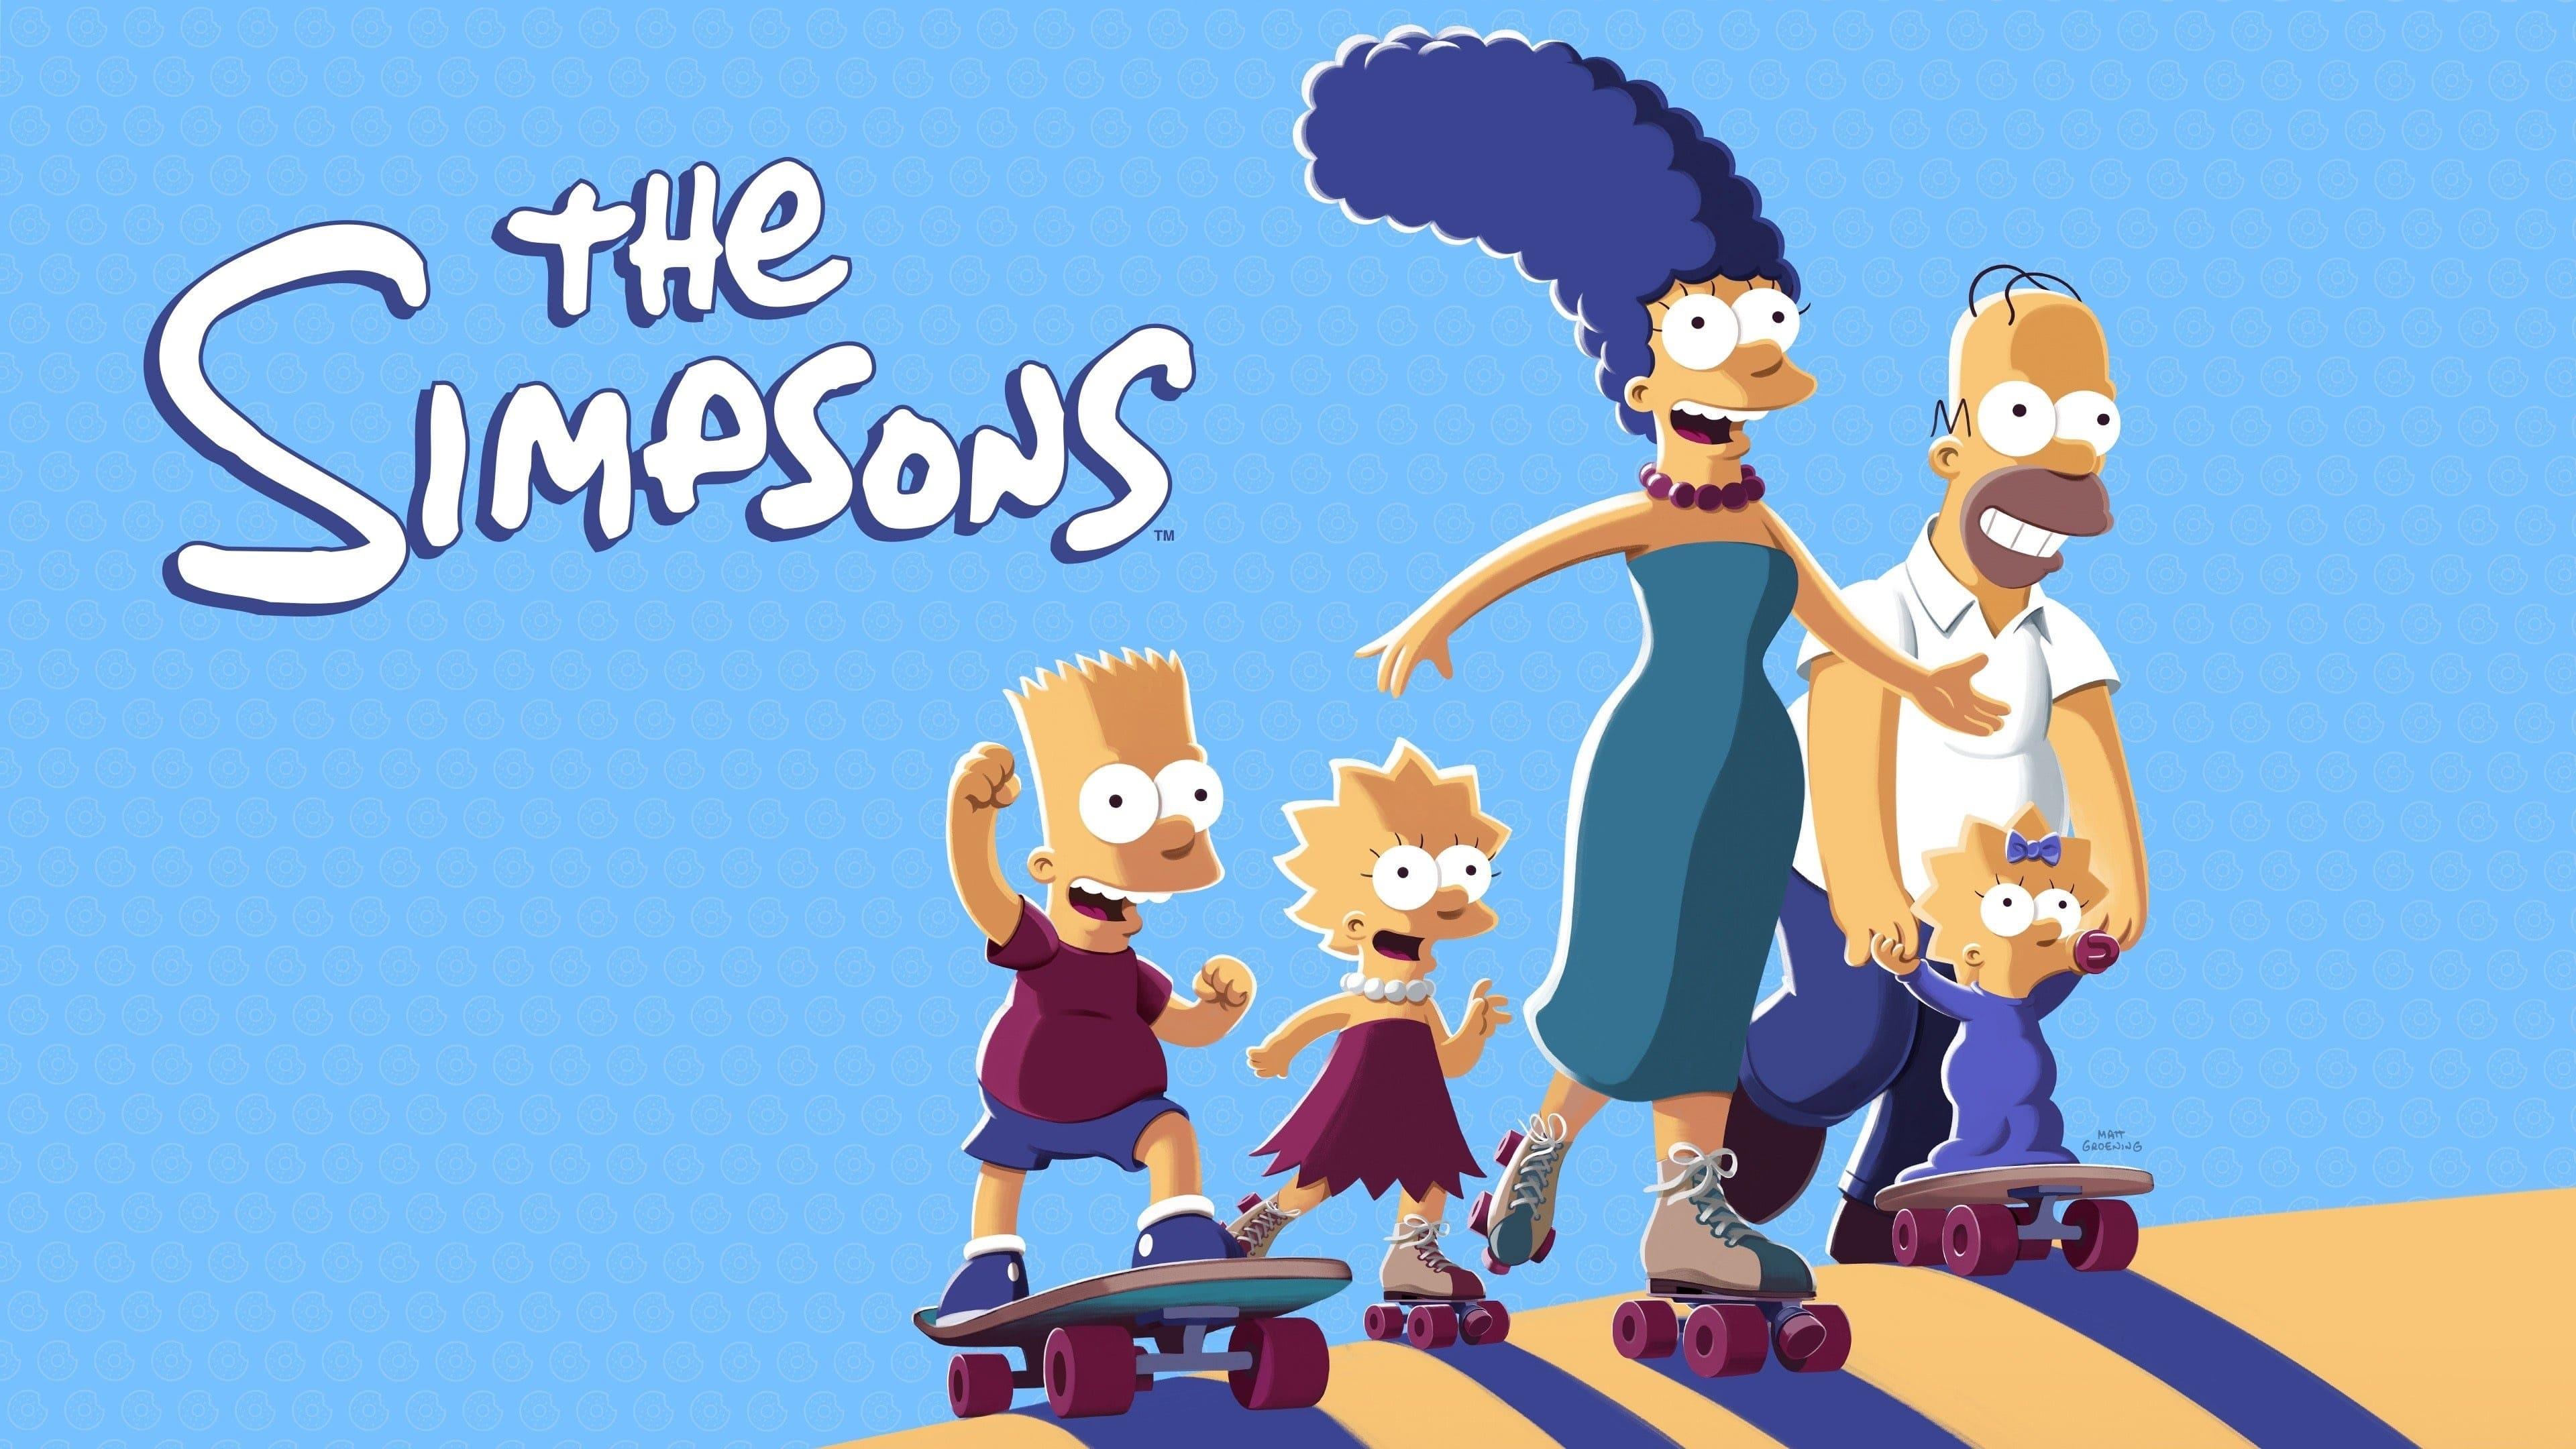 The Simpsons - Season 8 (1970)